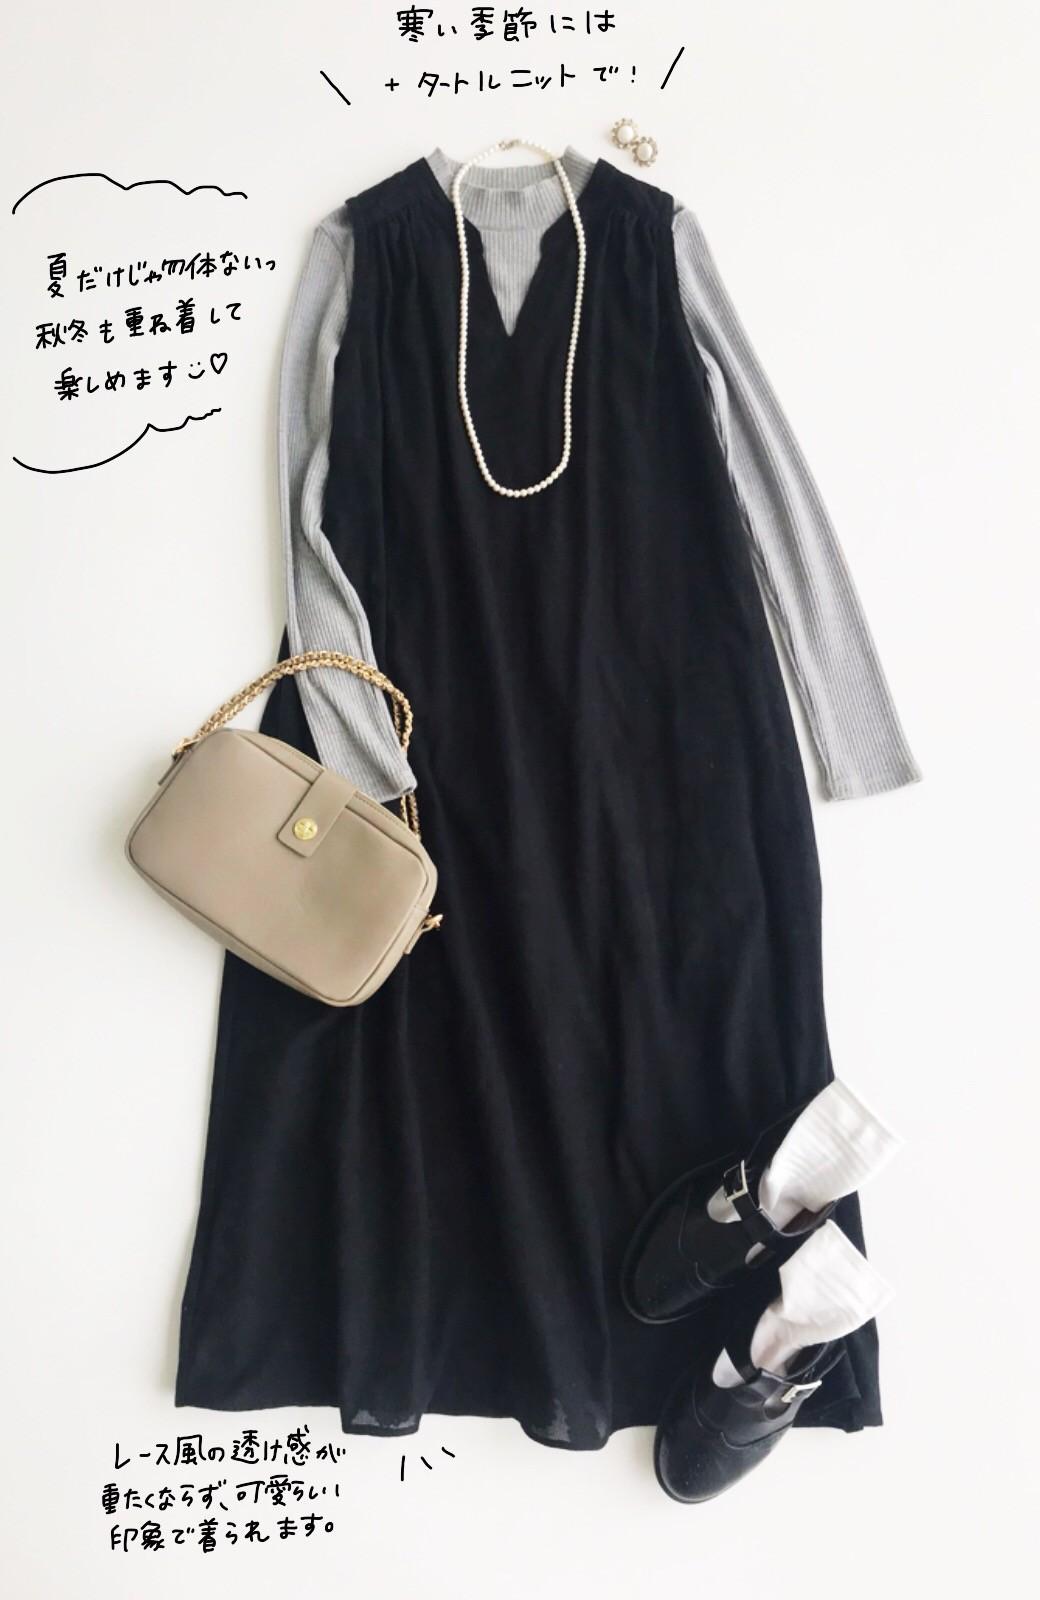 haco! 京都の浴衣屋さんと作った浴衣生地のロングワンピース <ブラック>の商品写真23